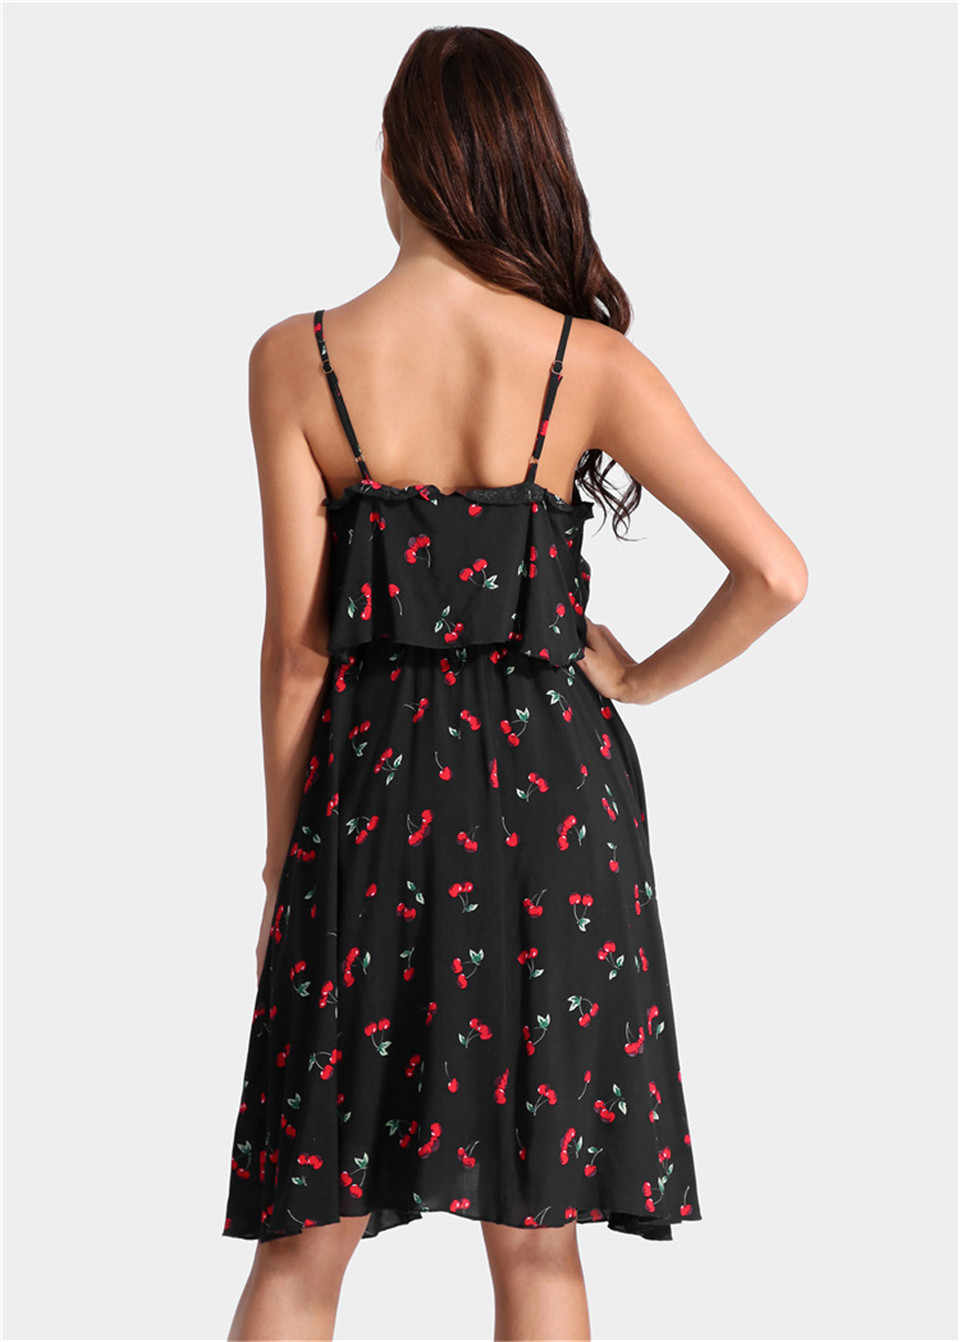 Elimiiya Fashion Wanita Selempang Cherry Cetak Gaun Elegan Tanpa Lengan Besar Pendulum Gaun Wanita Sifon Pakaian